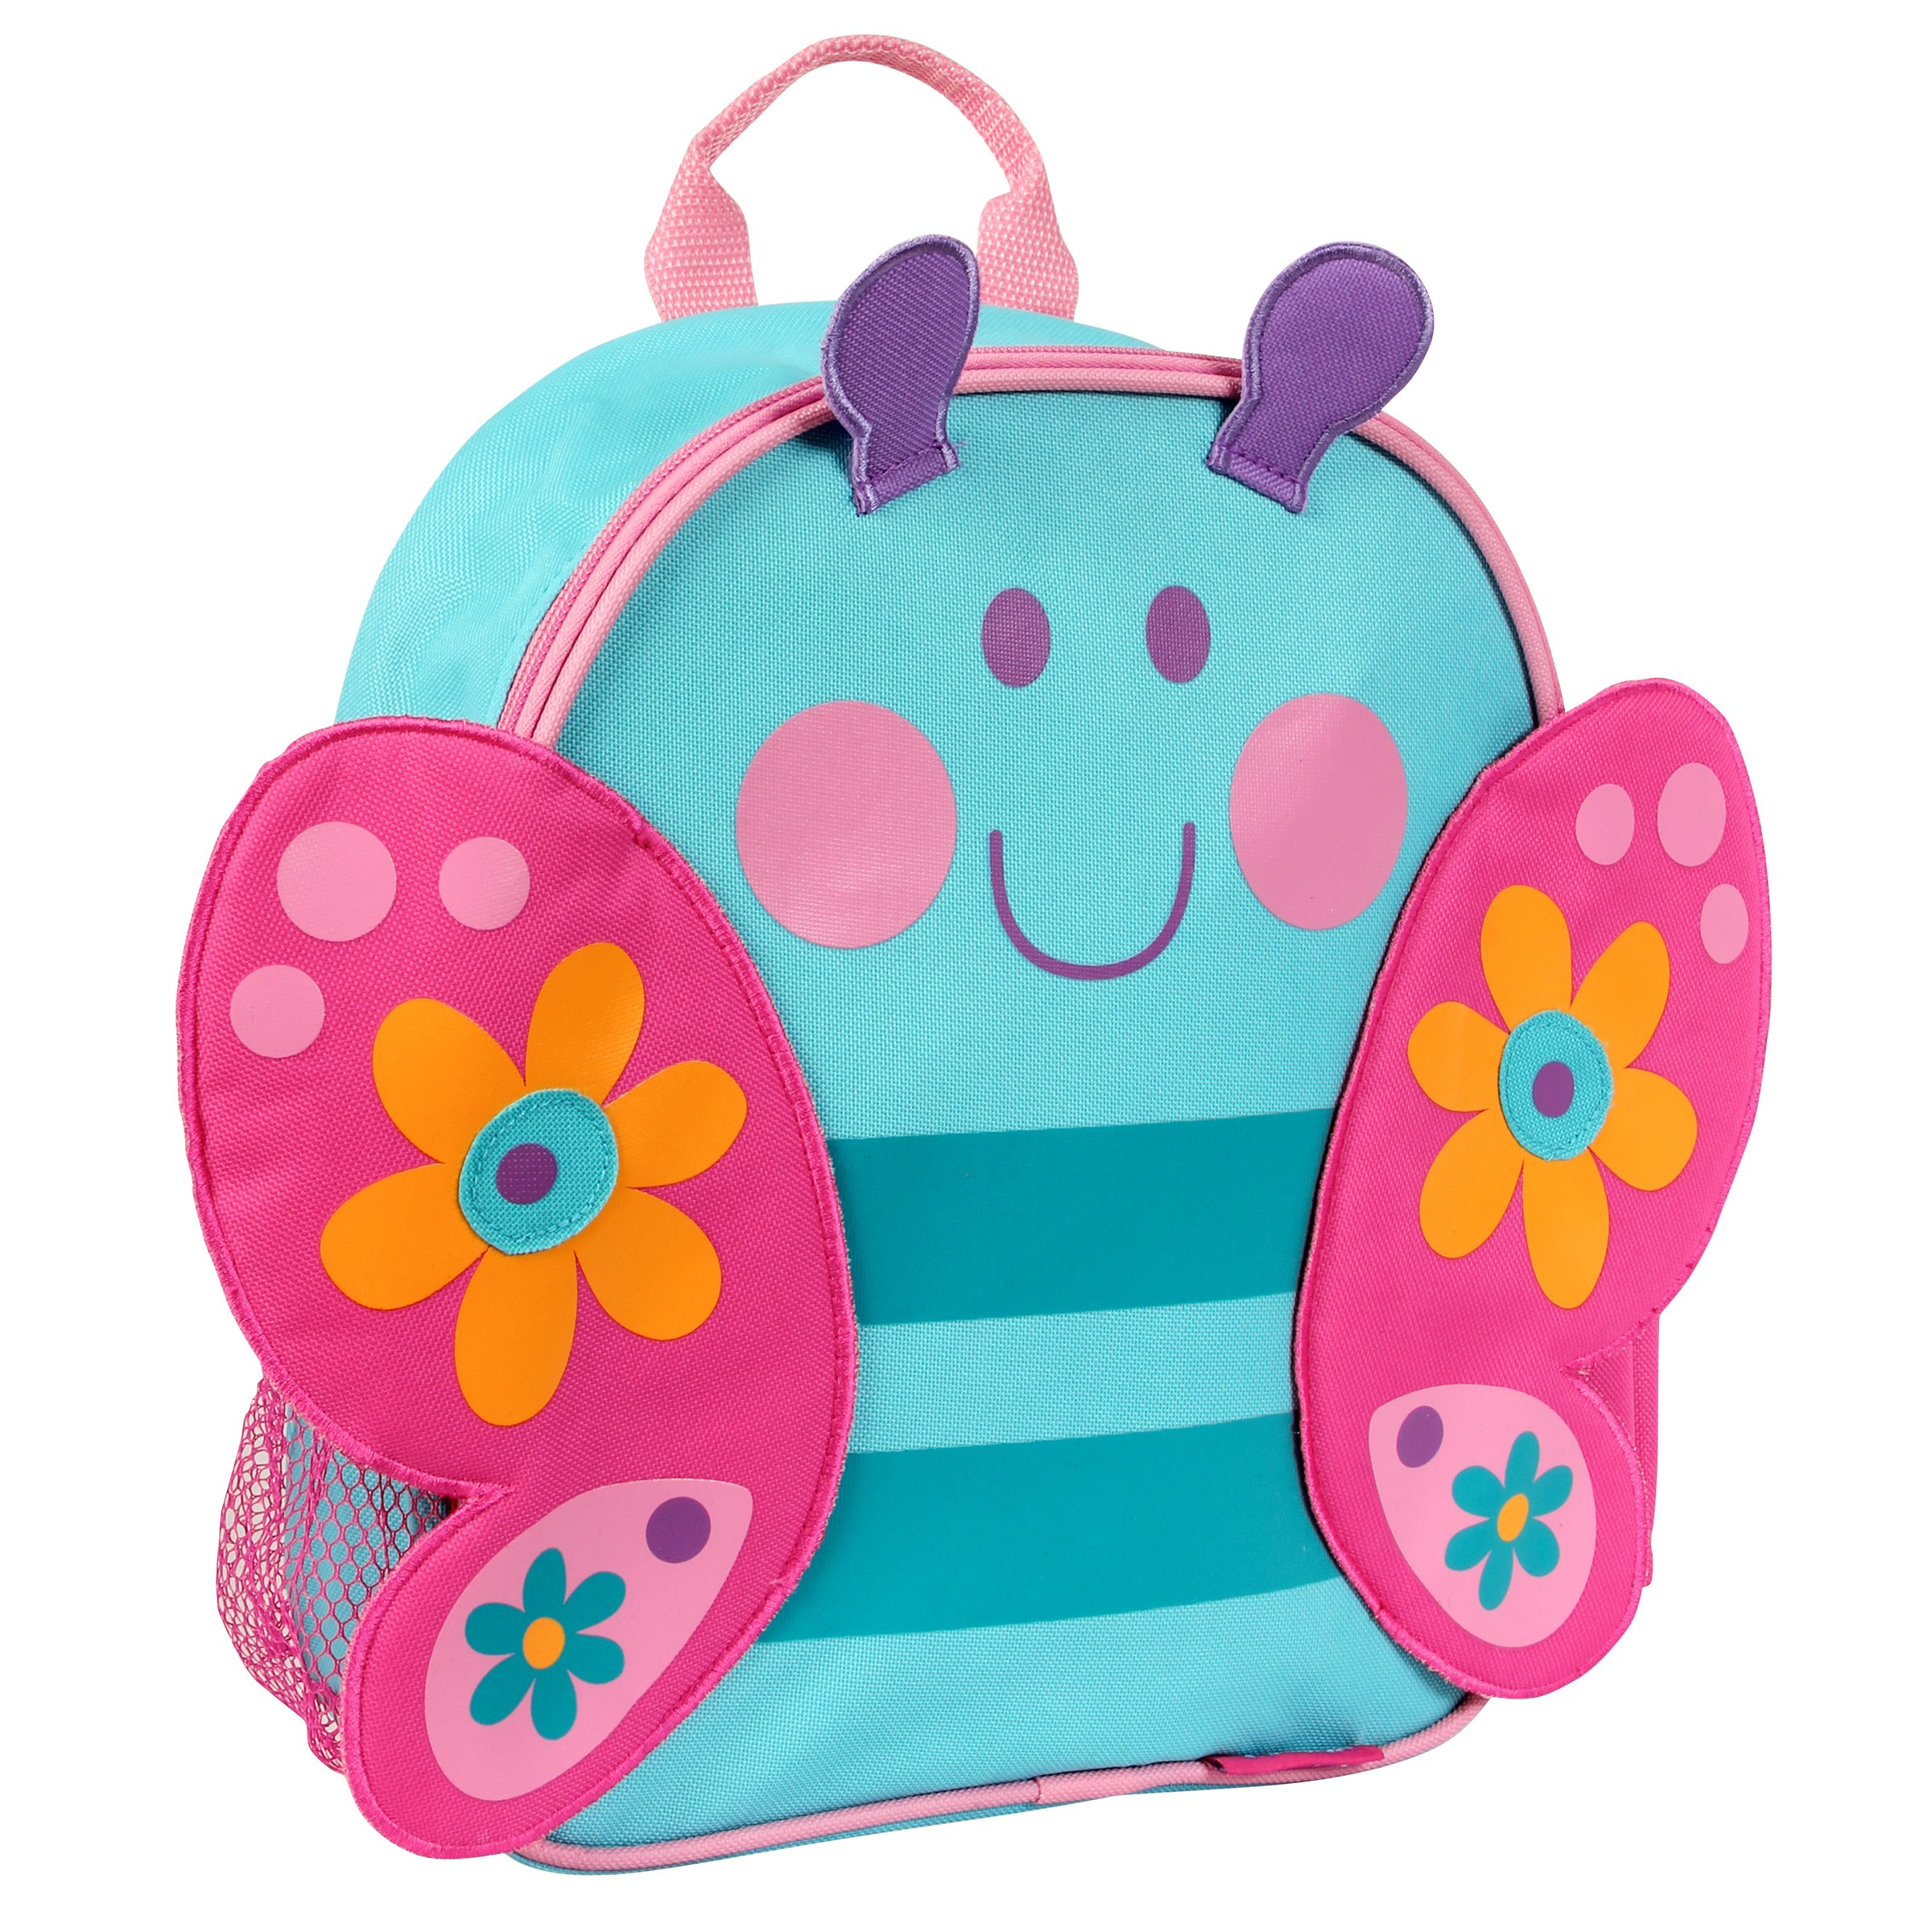 edc811546869 Buy Stephen Joseph Mini Sidekick Owl Backpack with Owl Zipper Pull ...